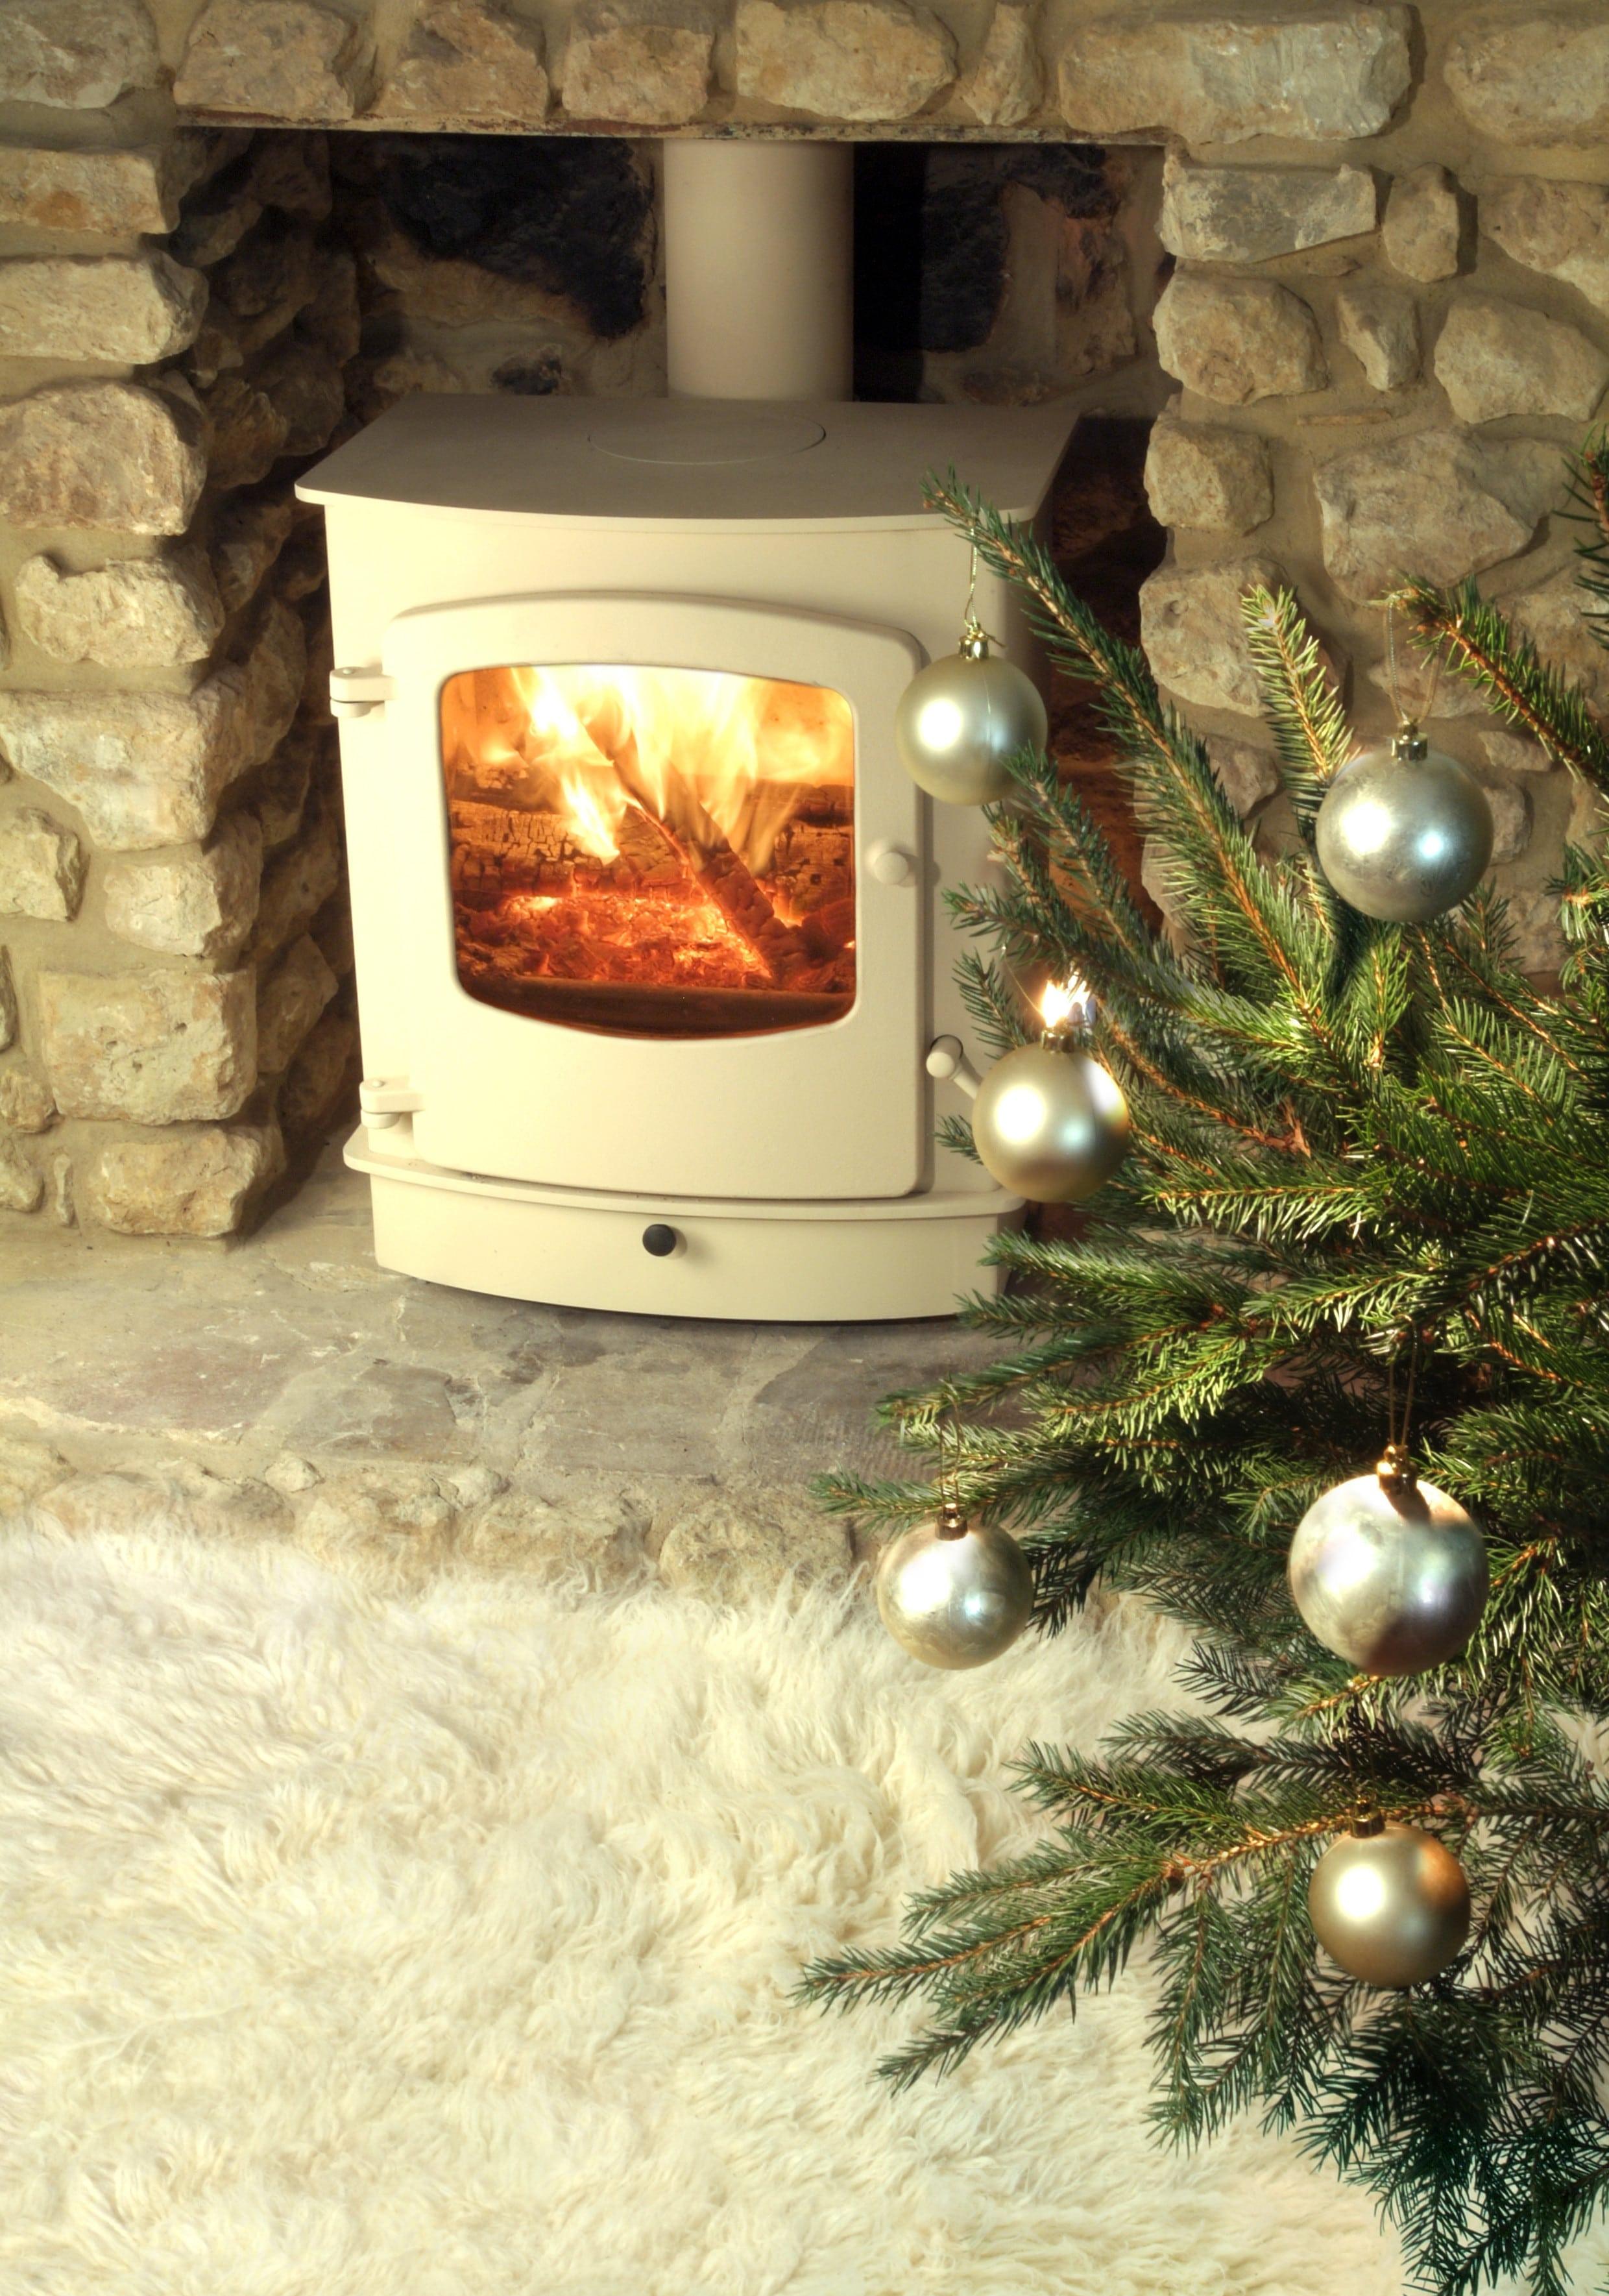 Ignite Stoves Amp Fireplaces Cove 2 Woodburning Amp Multi